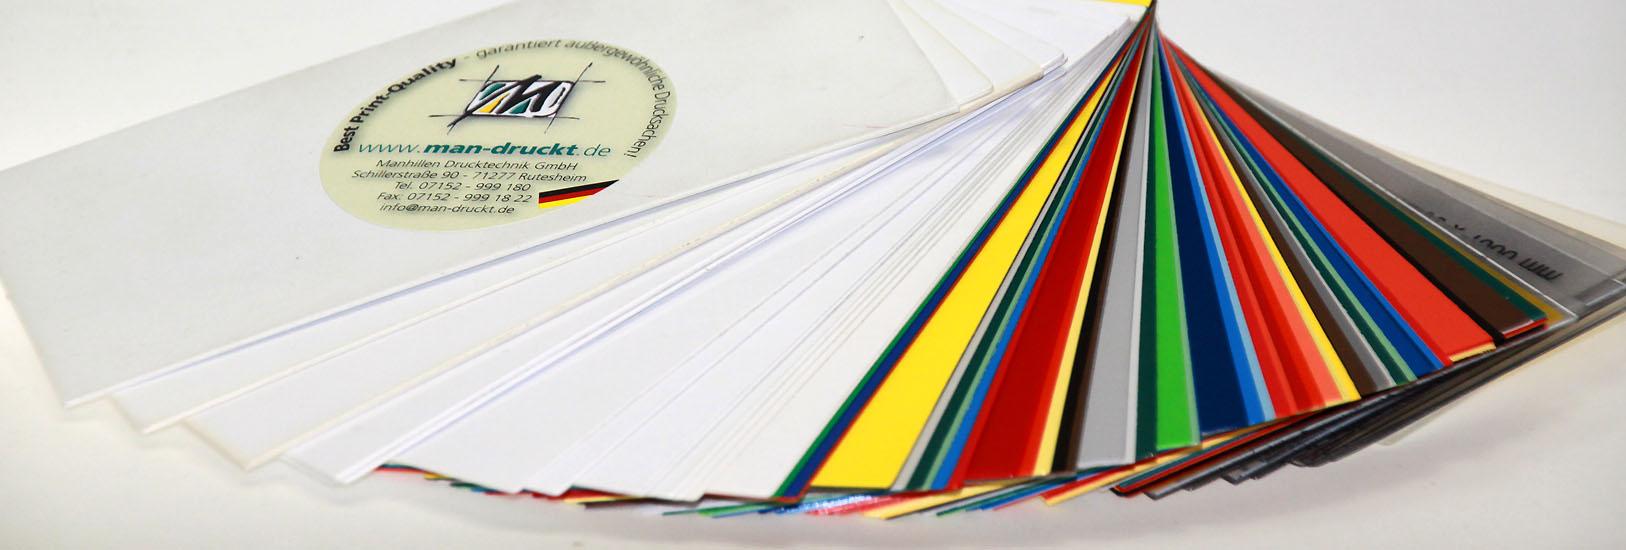 Plastikkarten drucken lassen pvc pet pc weiss transparent farbig in Rutesheim Leonberg Stuttgart